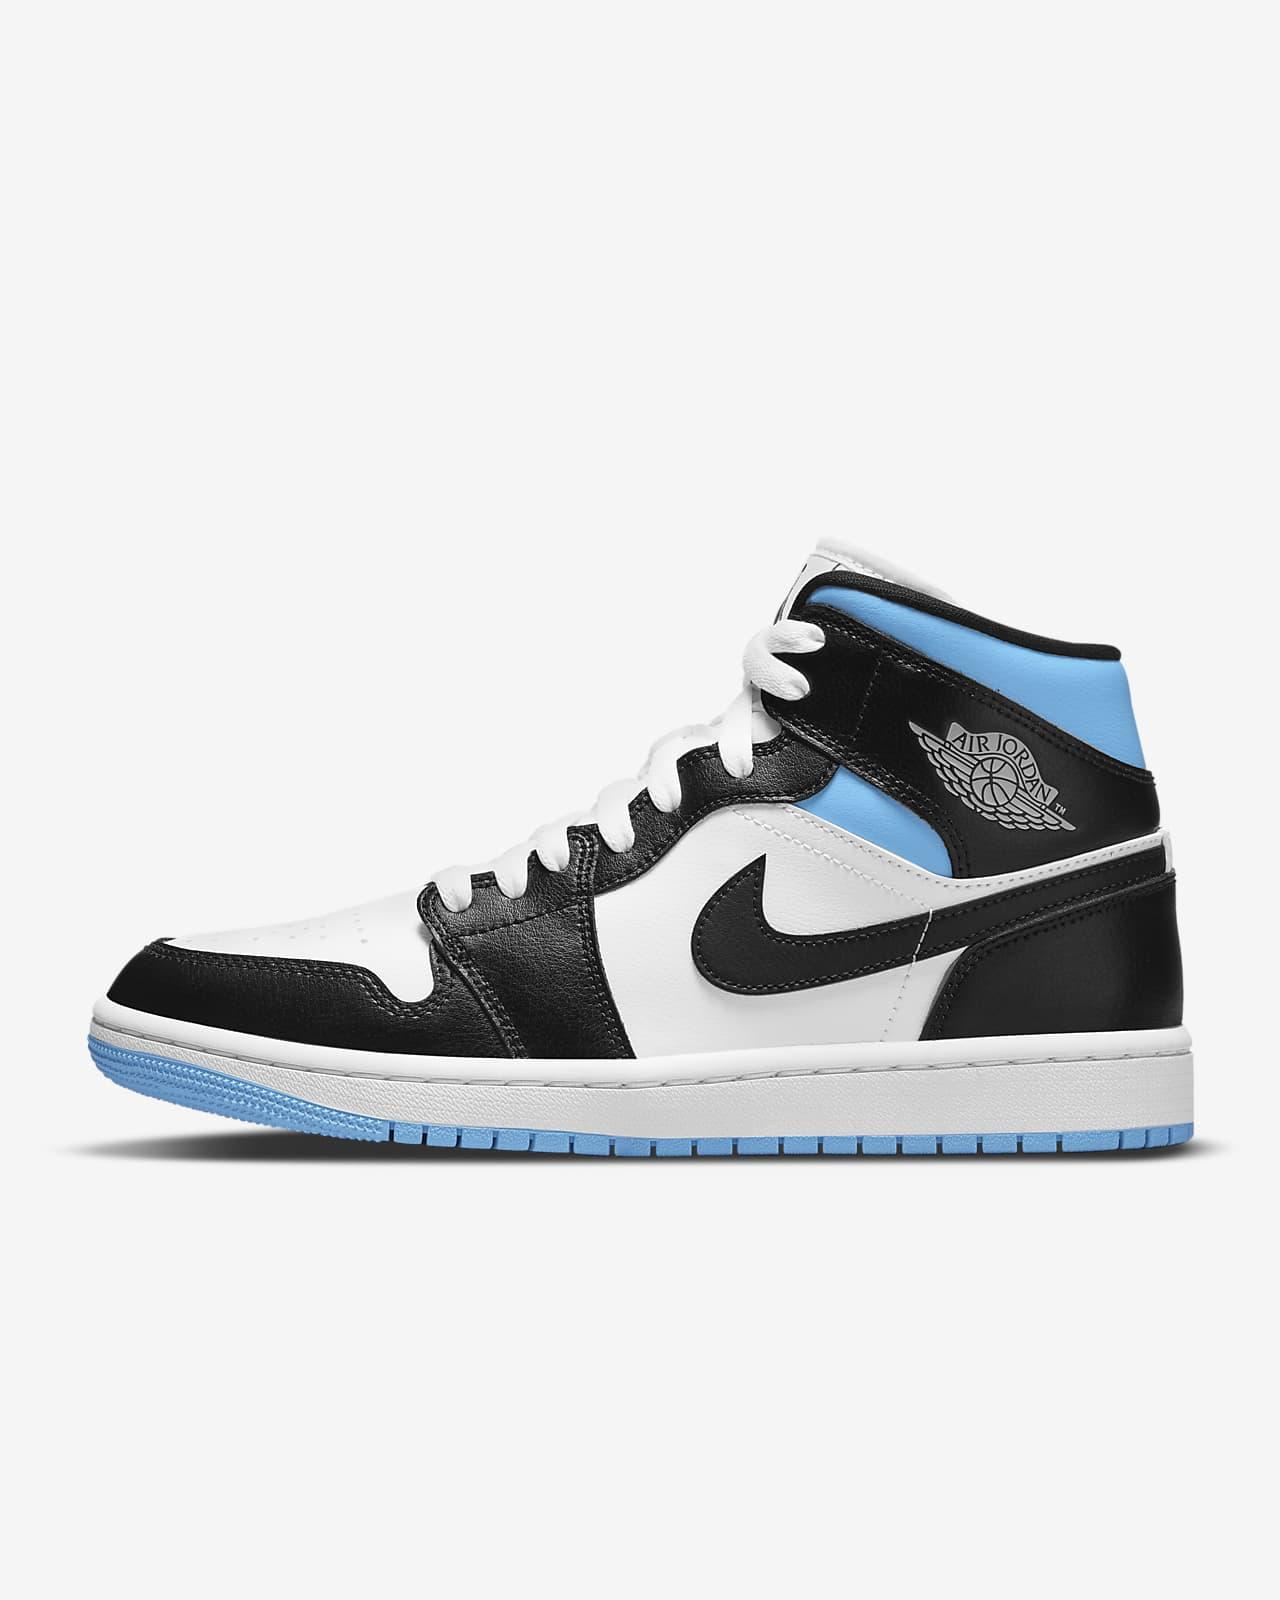 Air Jordan 1 Mid Women's Shoes